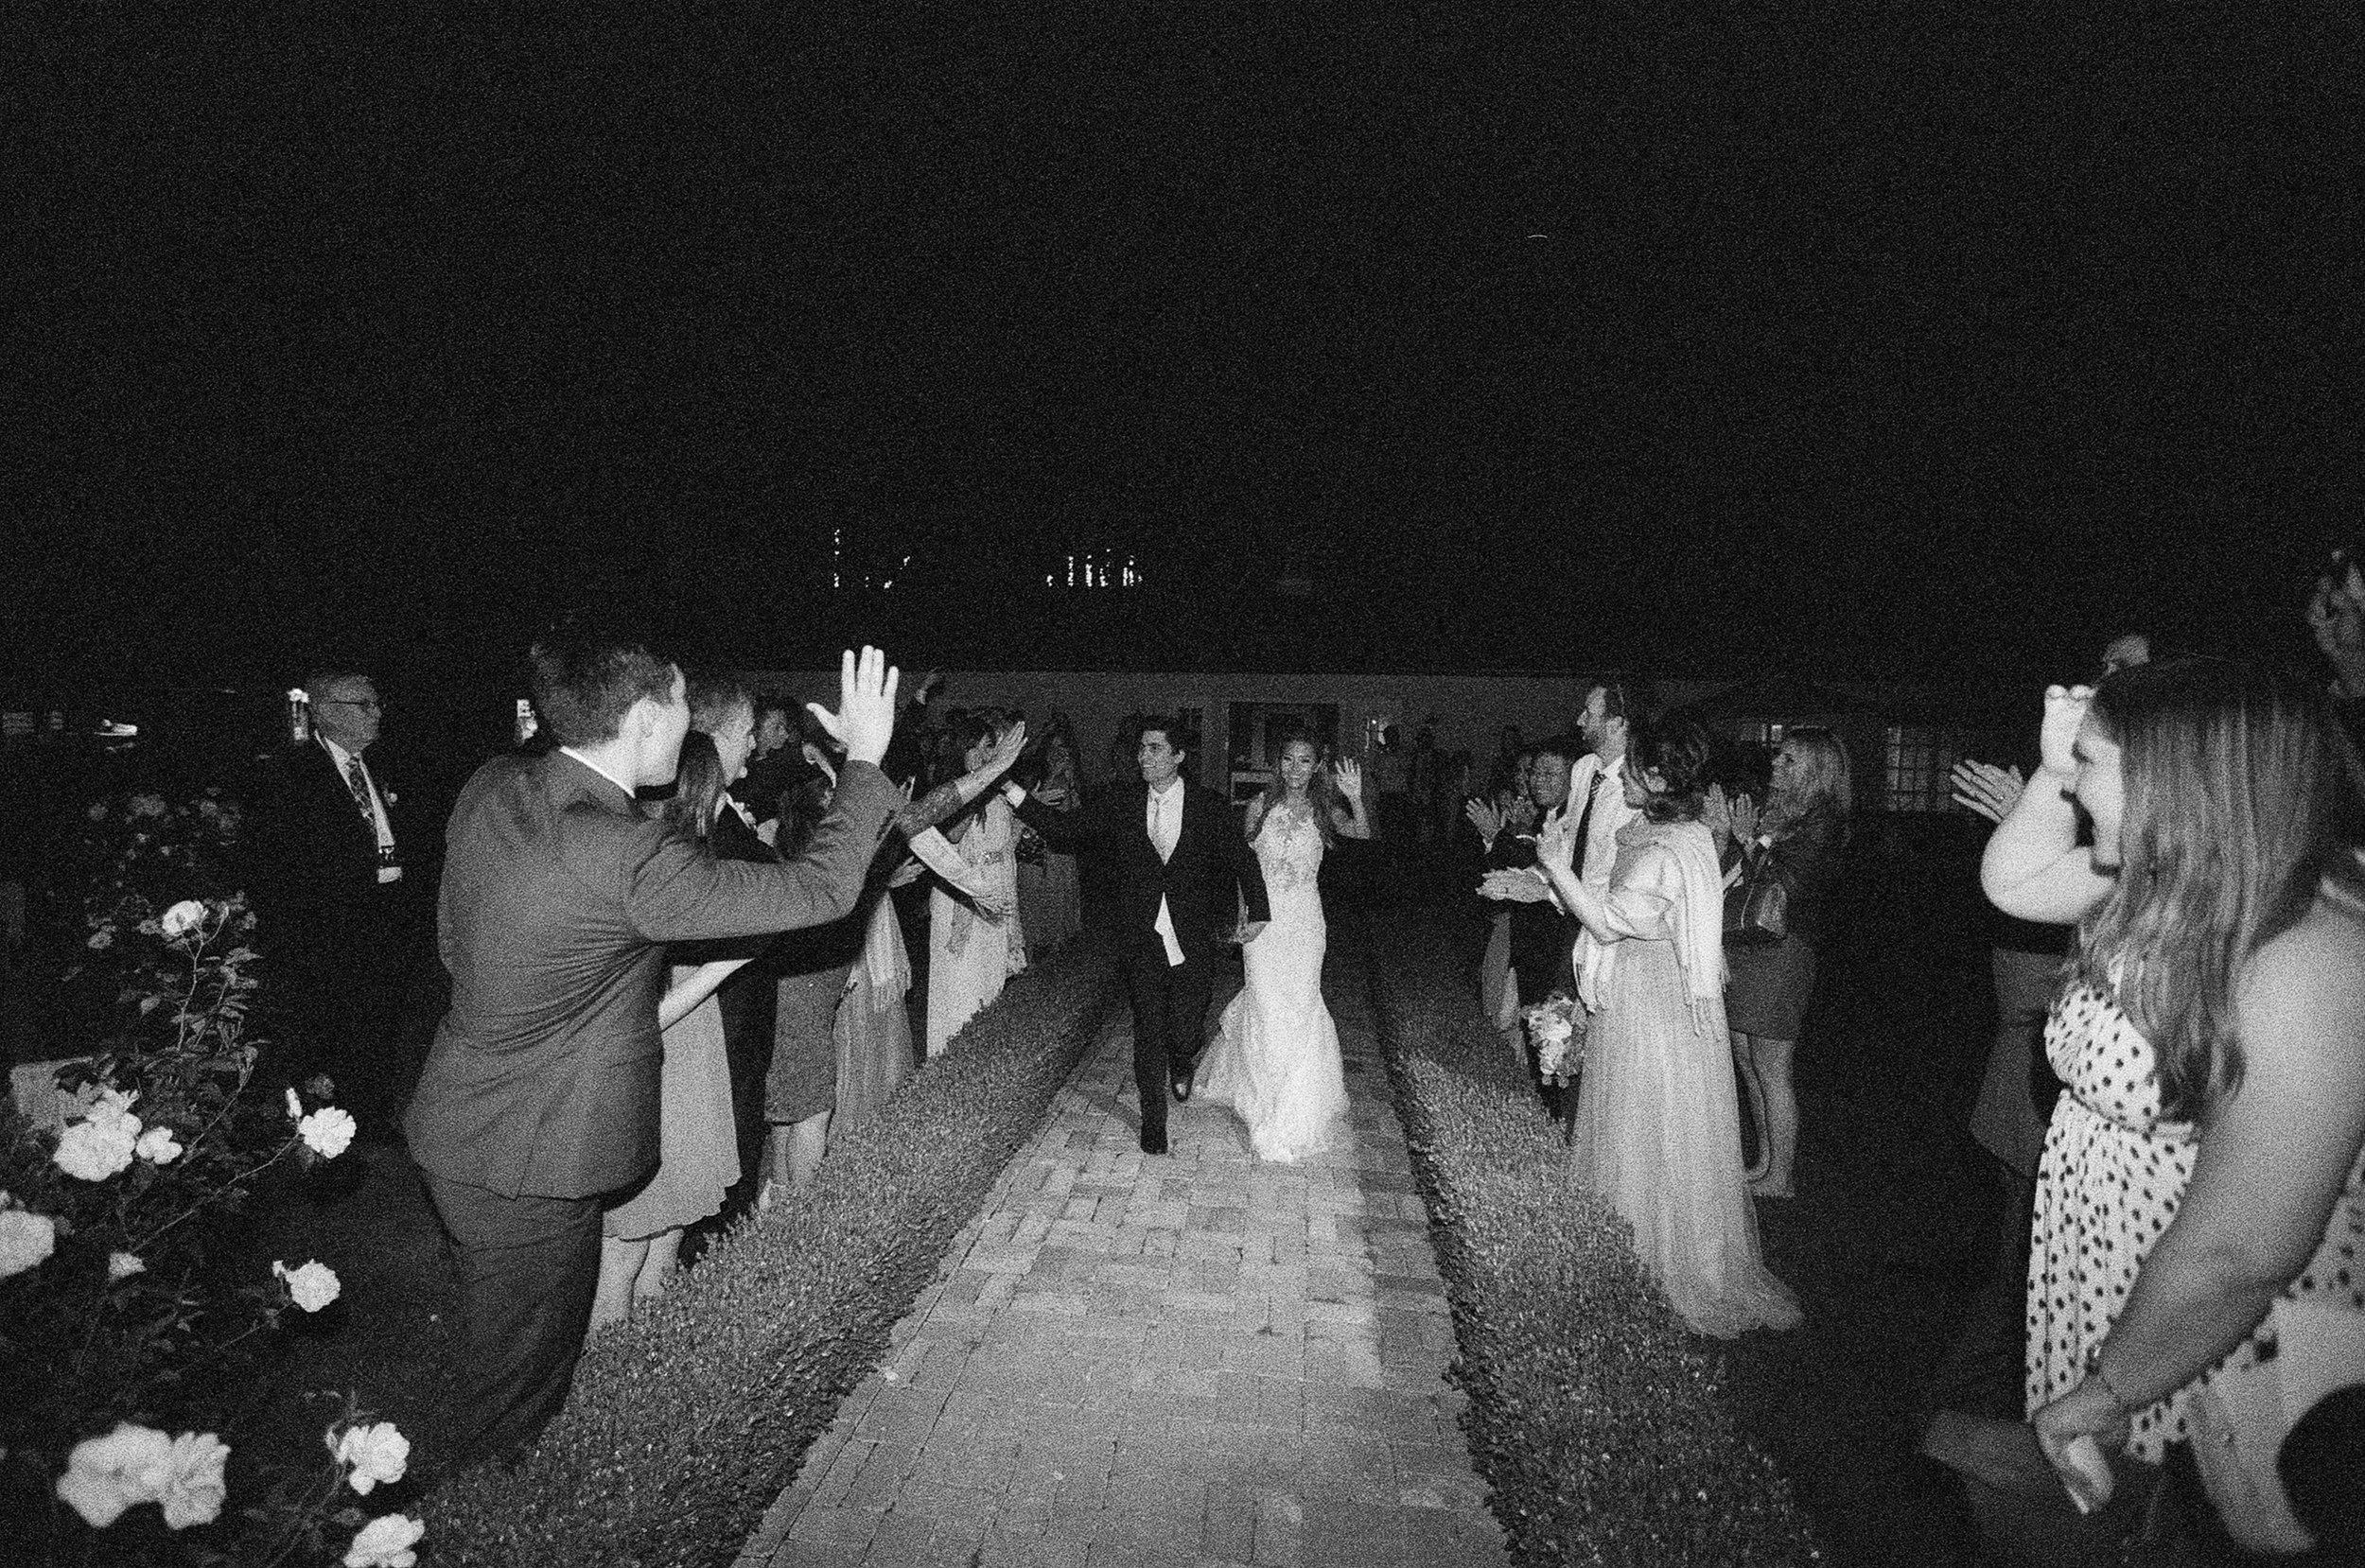 Triunfo_Creek_Winery_Wedding-308-Jen-Huang-JL_Jen_Huang_KB_(453).jpg